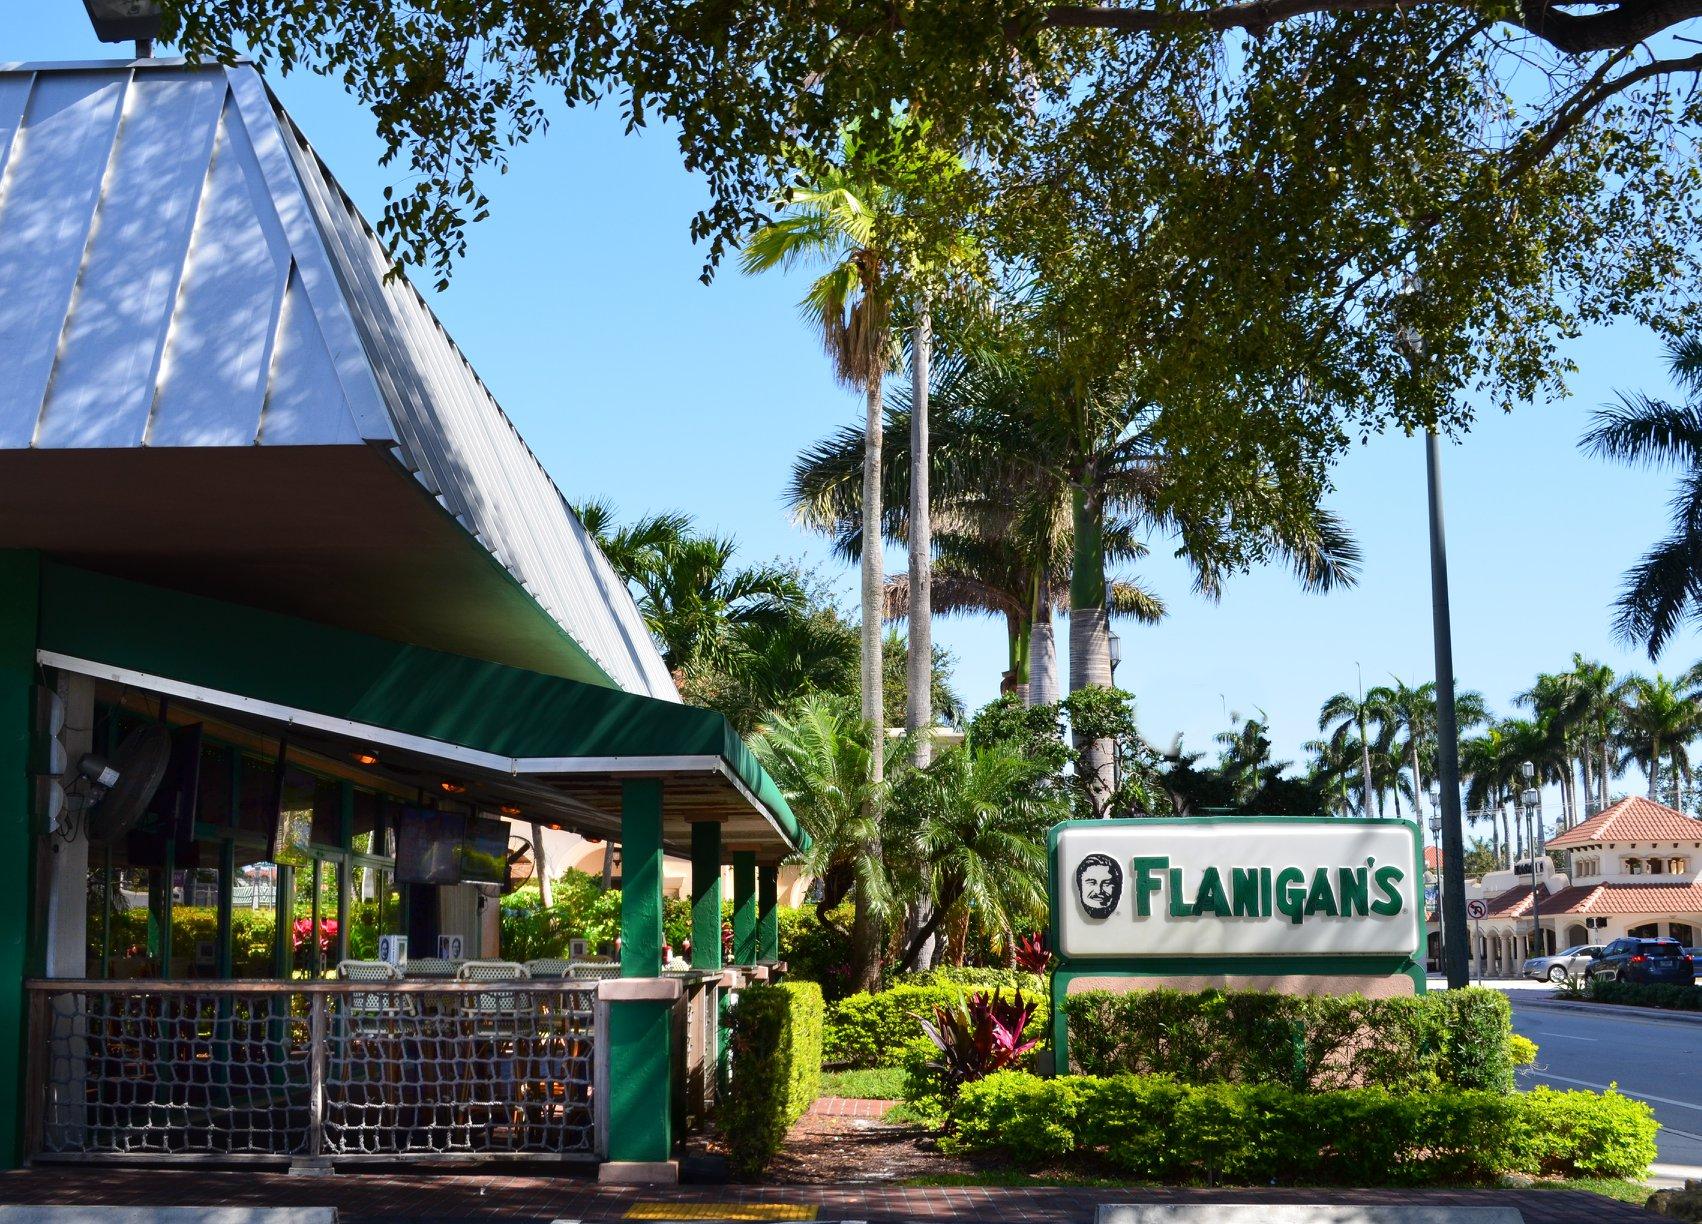 Flanigan's Boca Raton